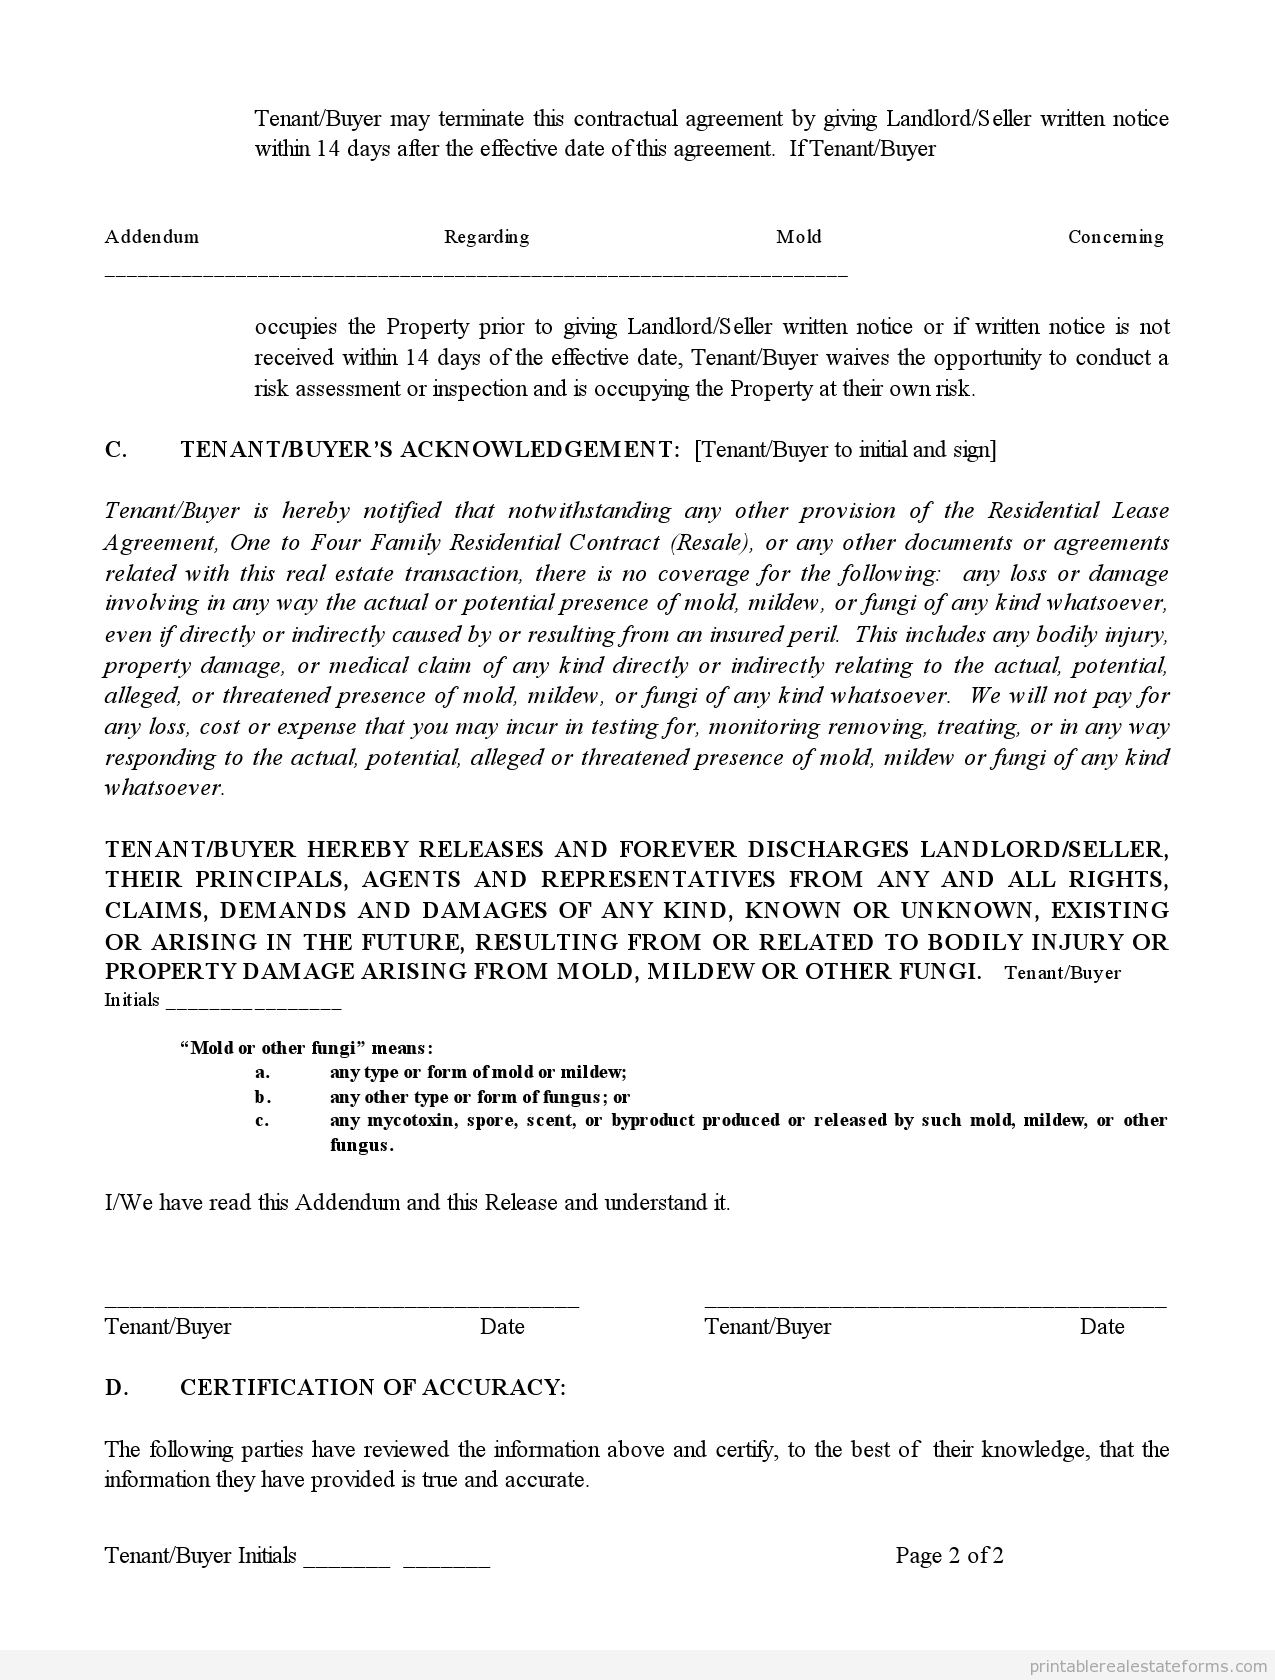 Printable Addendum Regarding Mold Template   Sample Forms